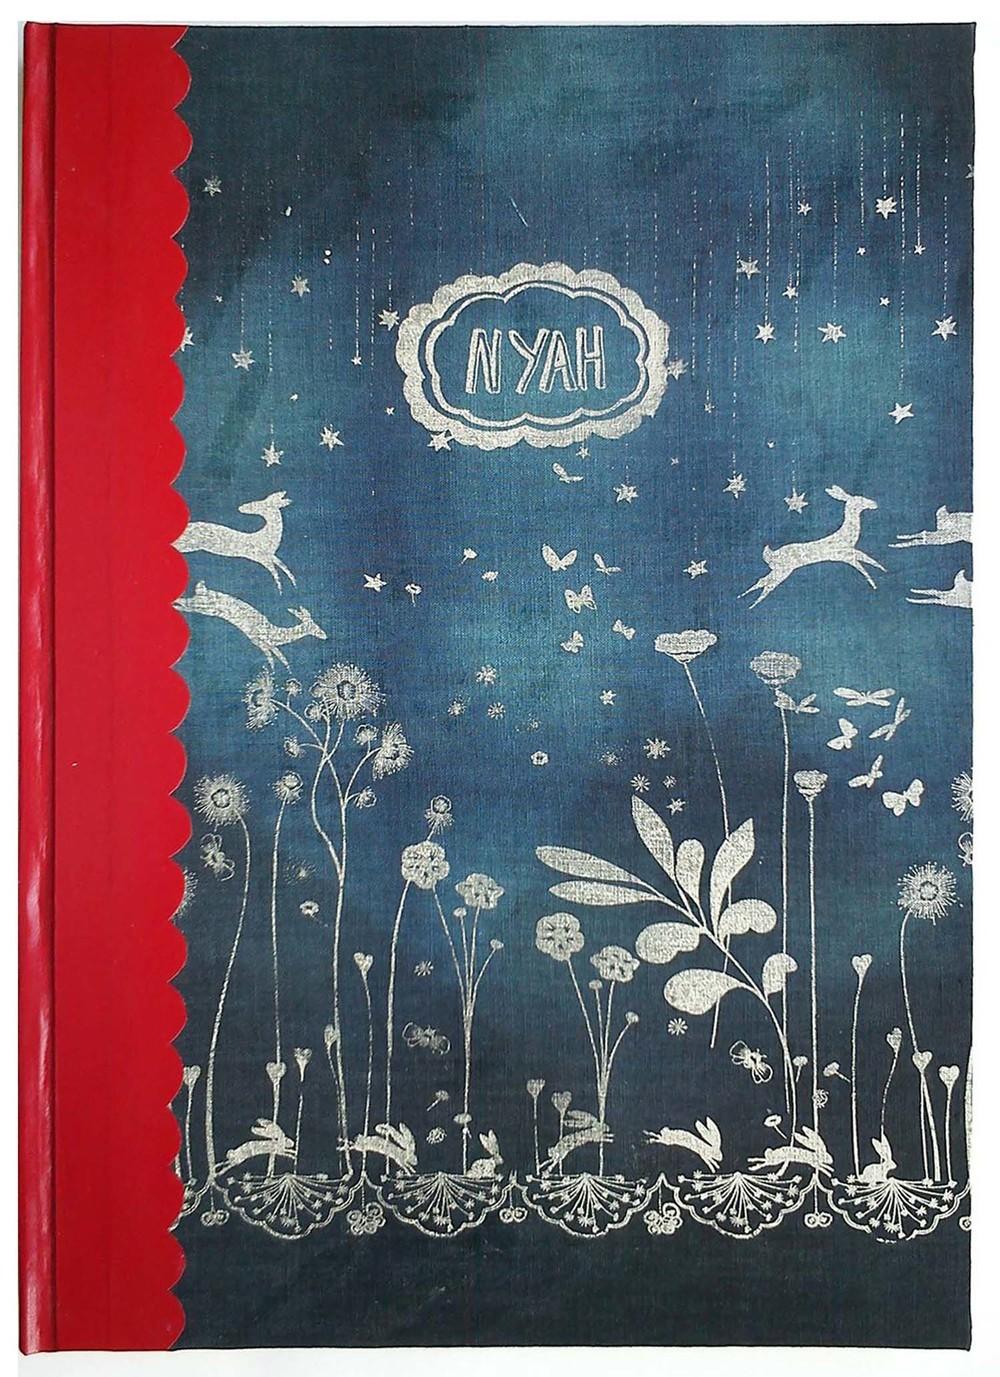 Album for Nyah jacket design